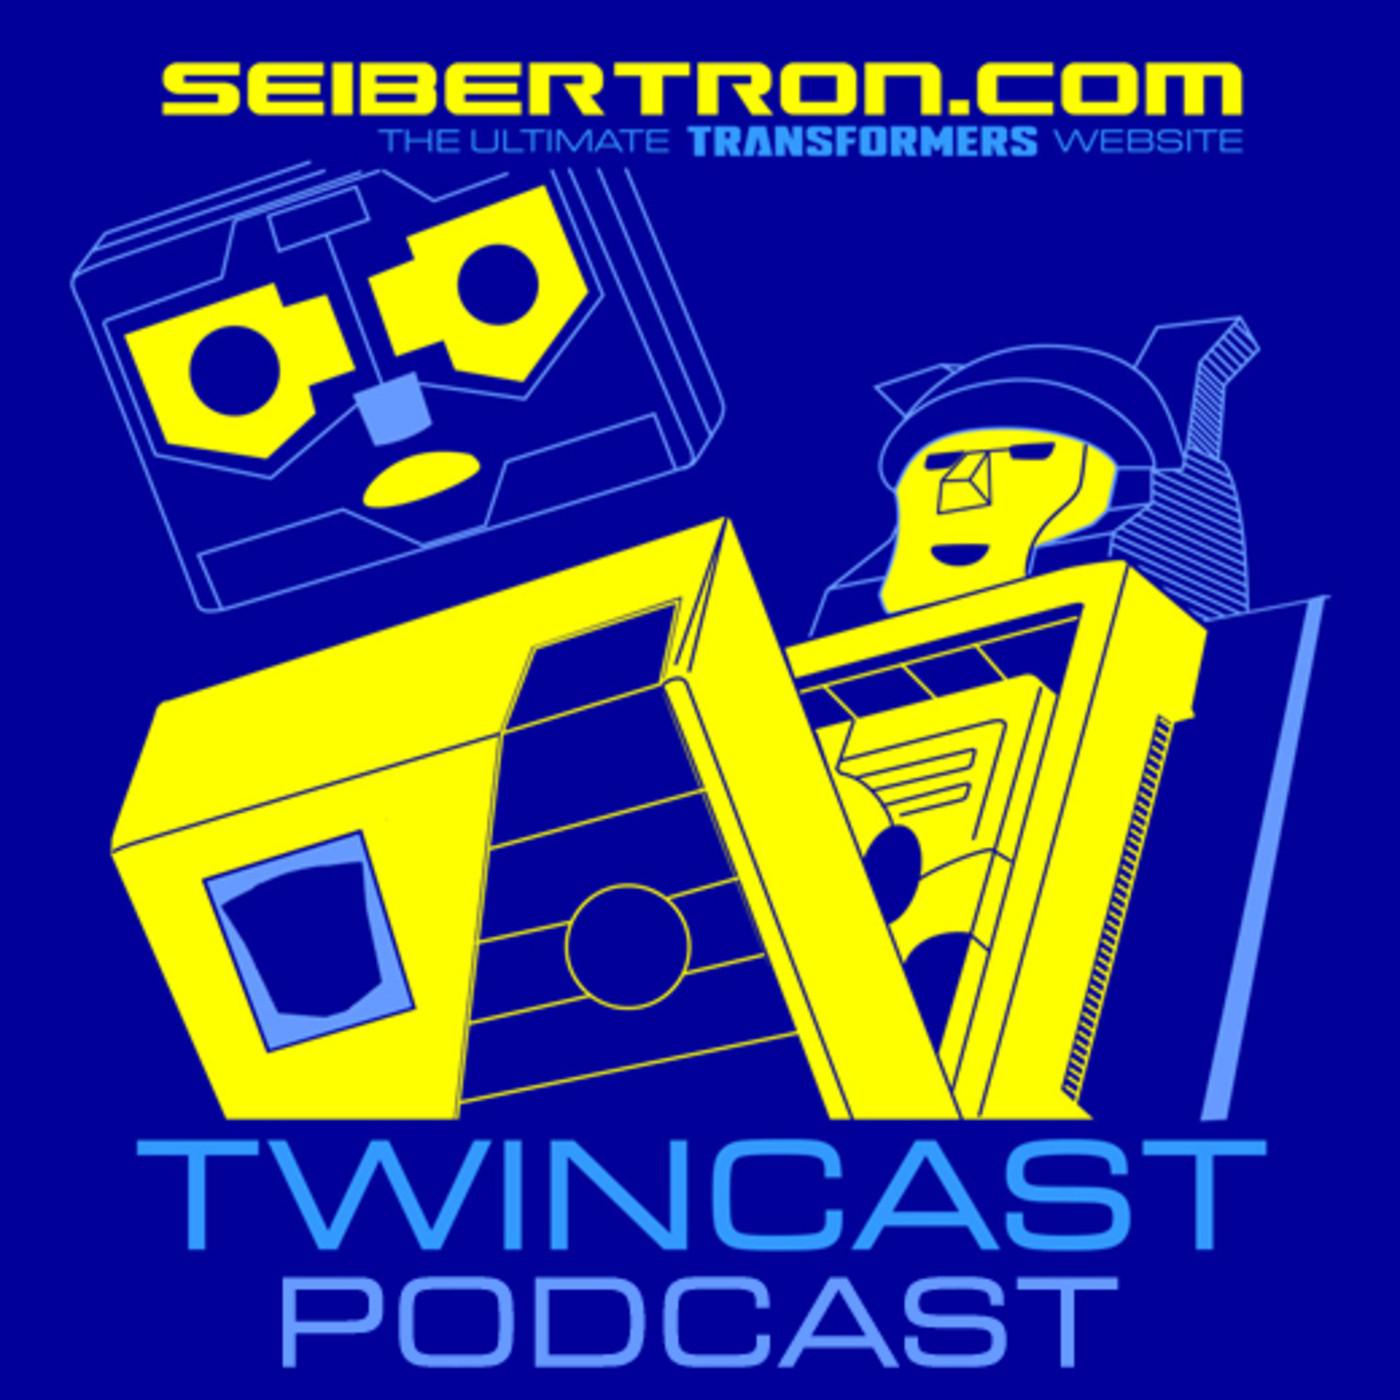 "Seibertron.com Twincast / Podcast #75 ""Lady Robots"""